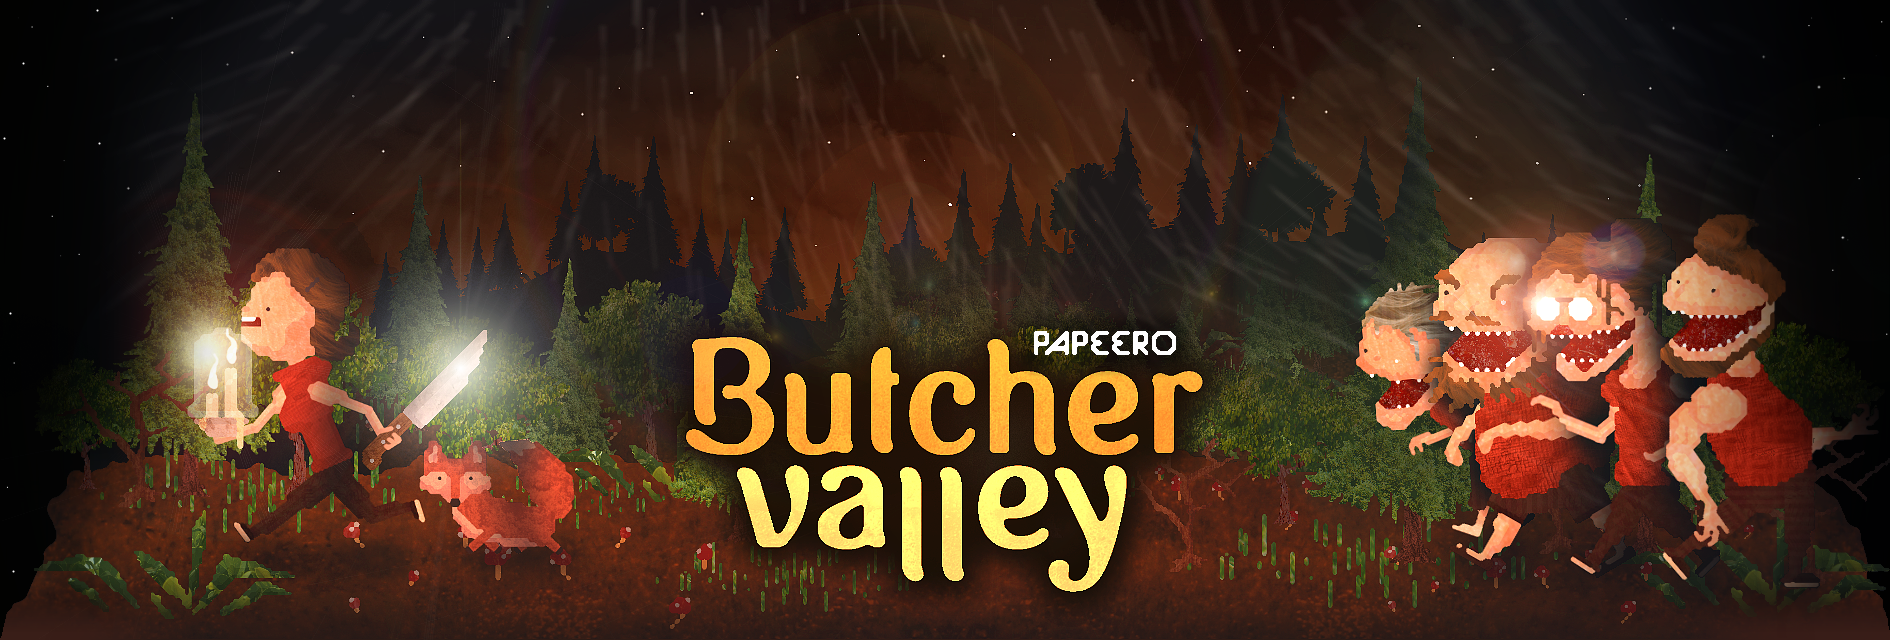 Butcher Valley